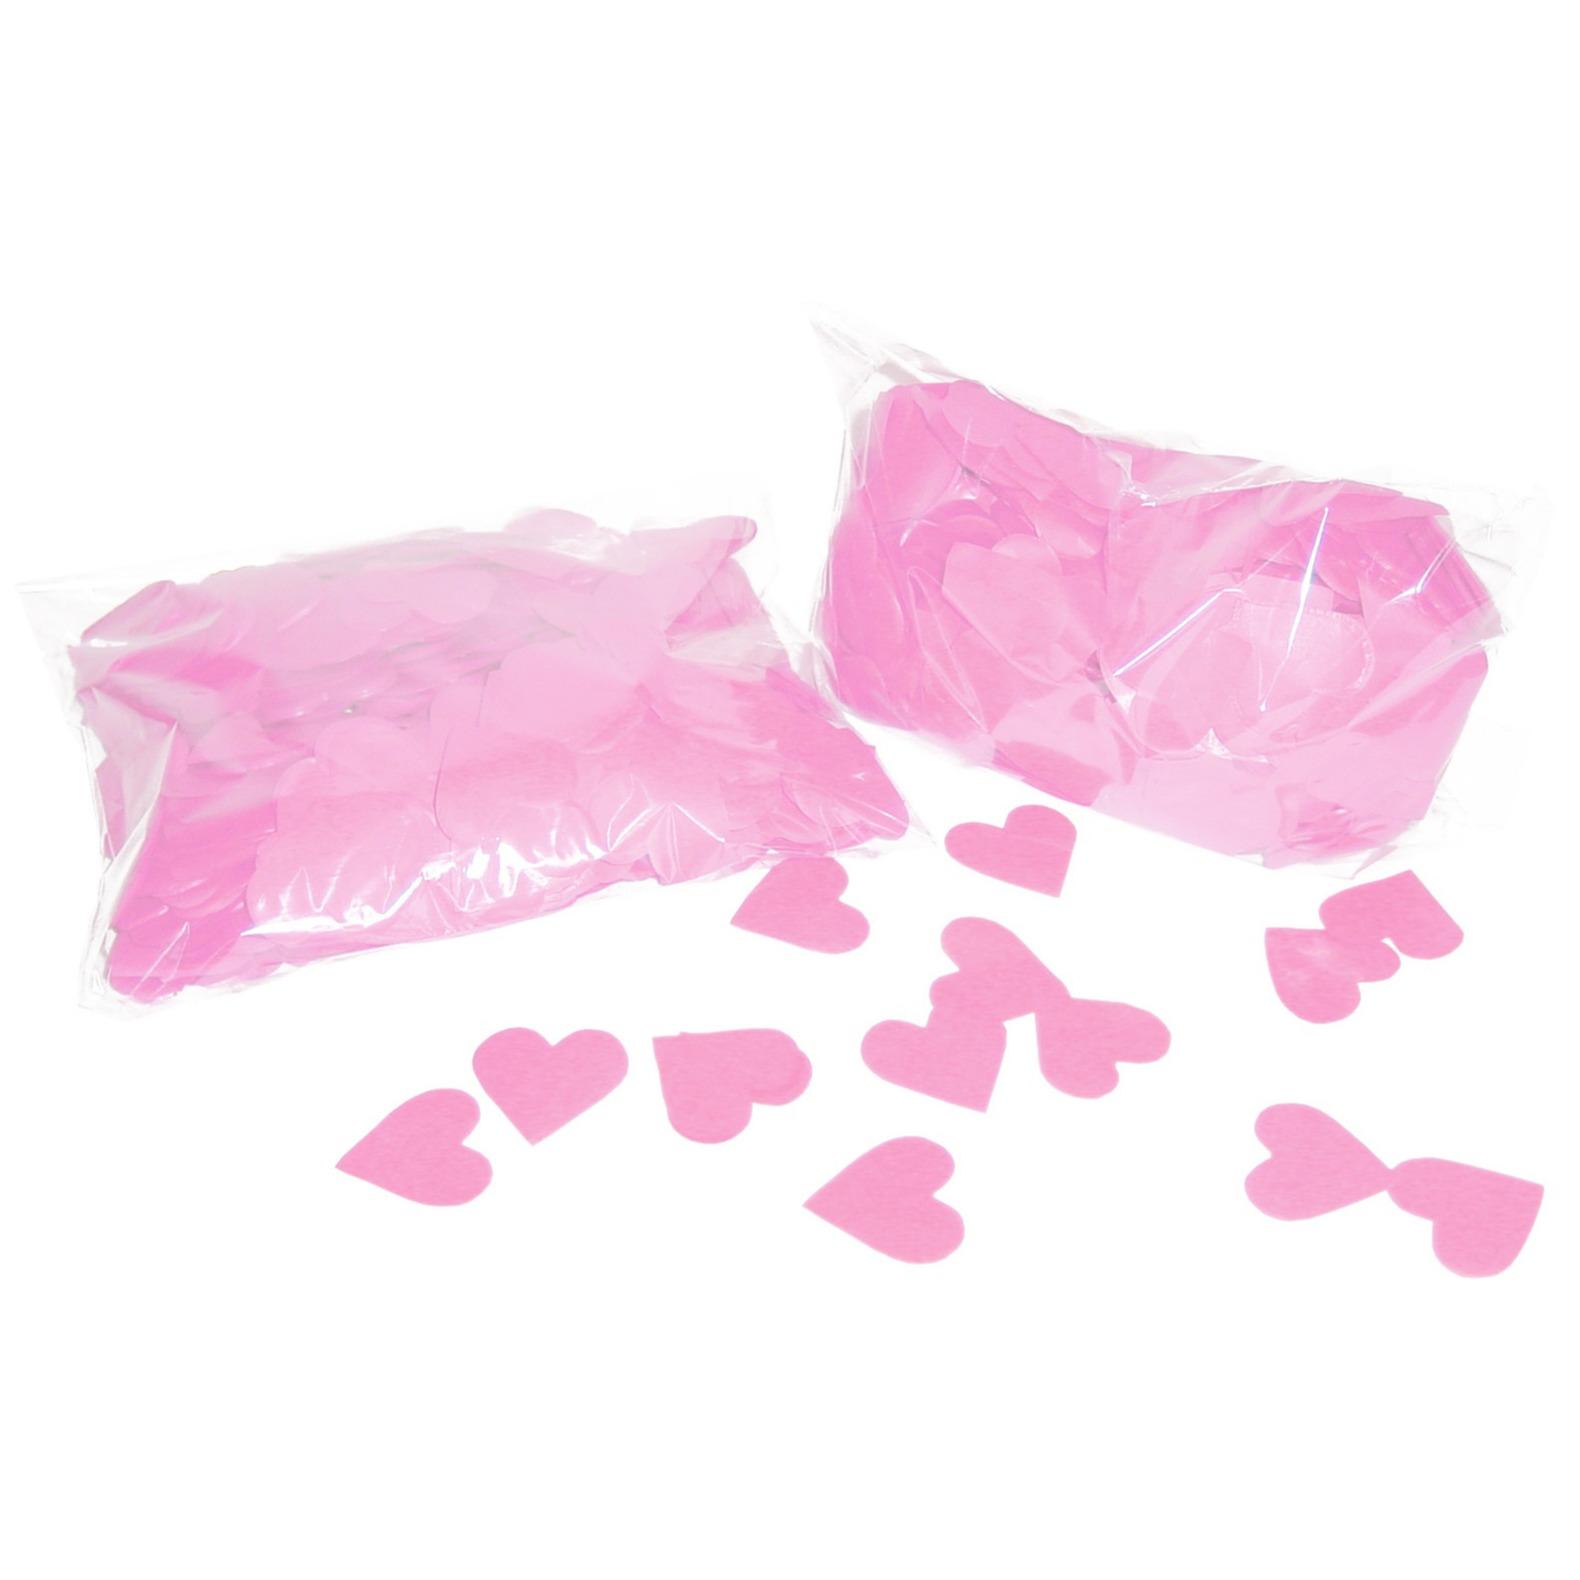 1x Roze hartjes confetti mix zakje 250 gram